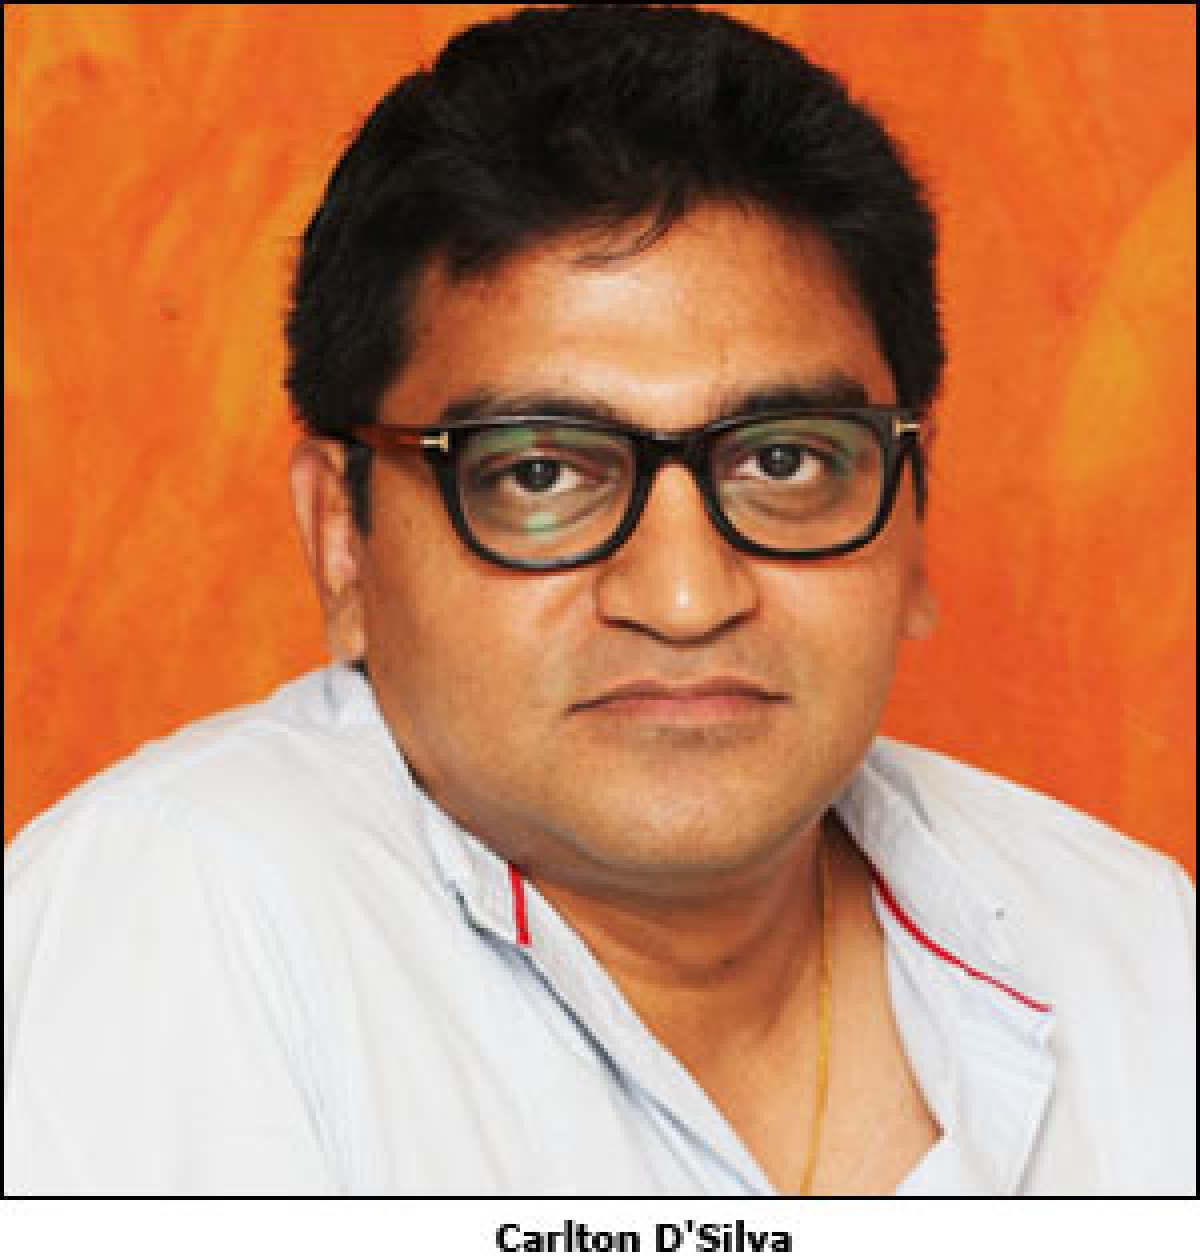 Hungama Digital appoints Surya Narayanan as head of business